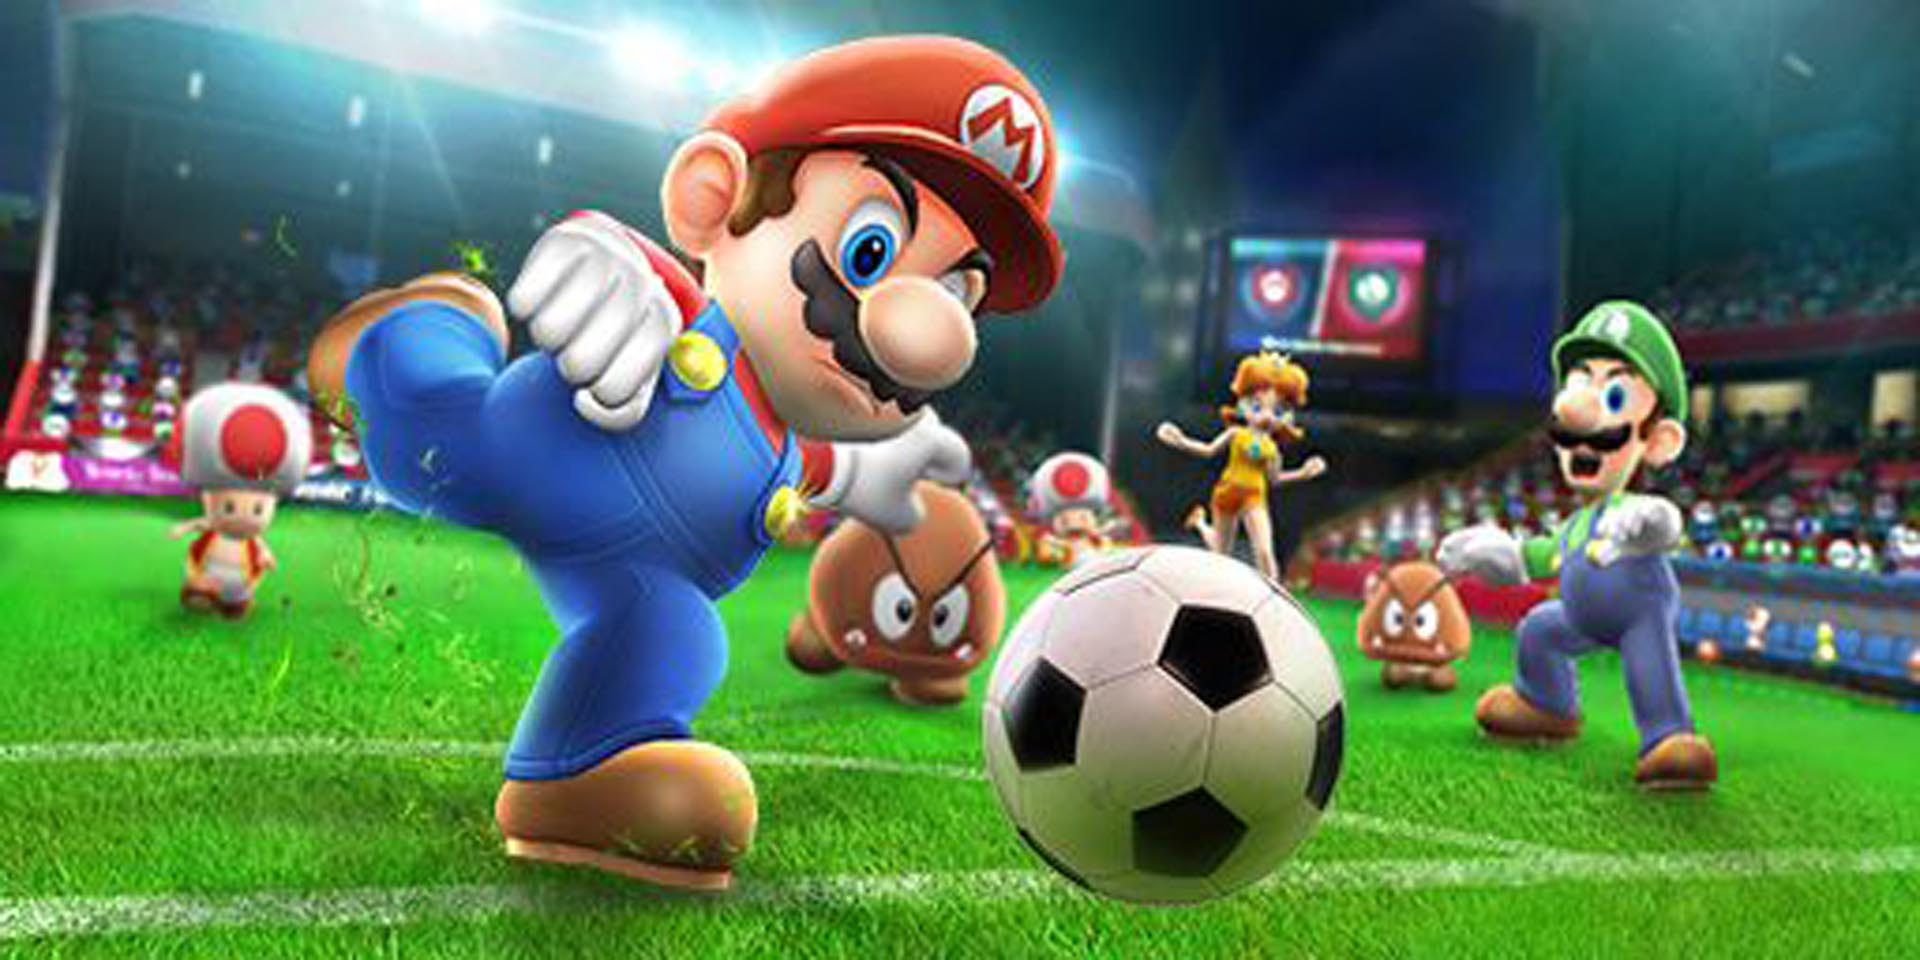 5_N3DS_MarioSportsSuperstars_Screenshot_CTRP_AUN_illu02_R_ad